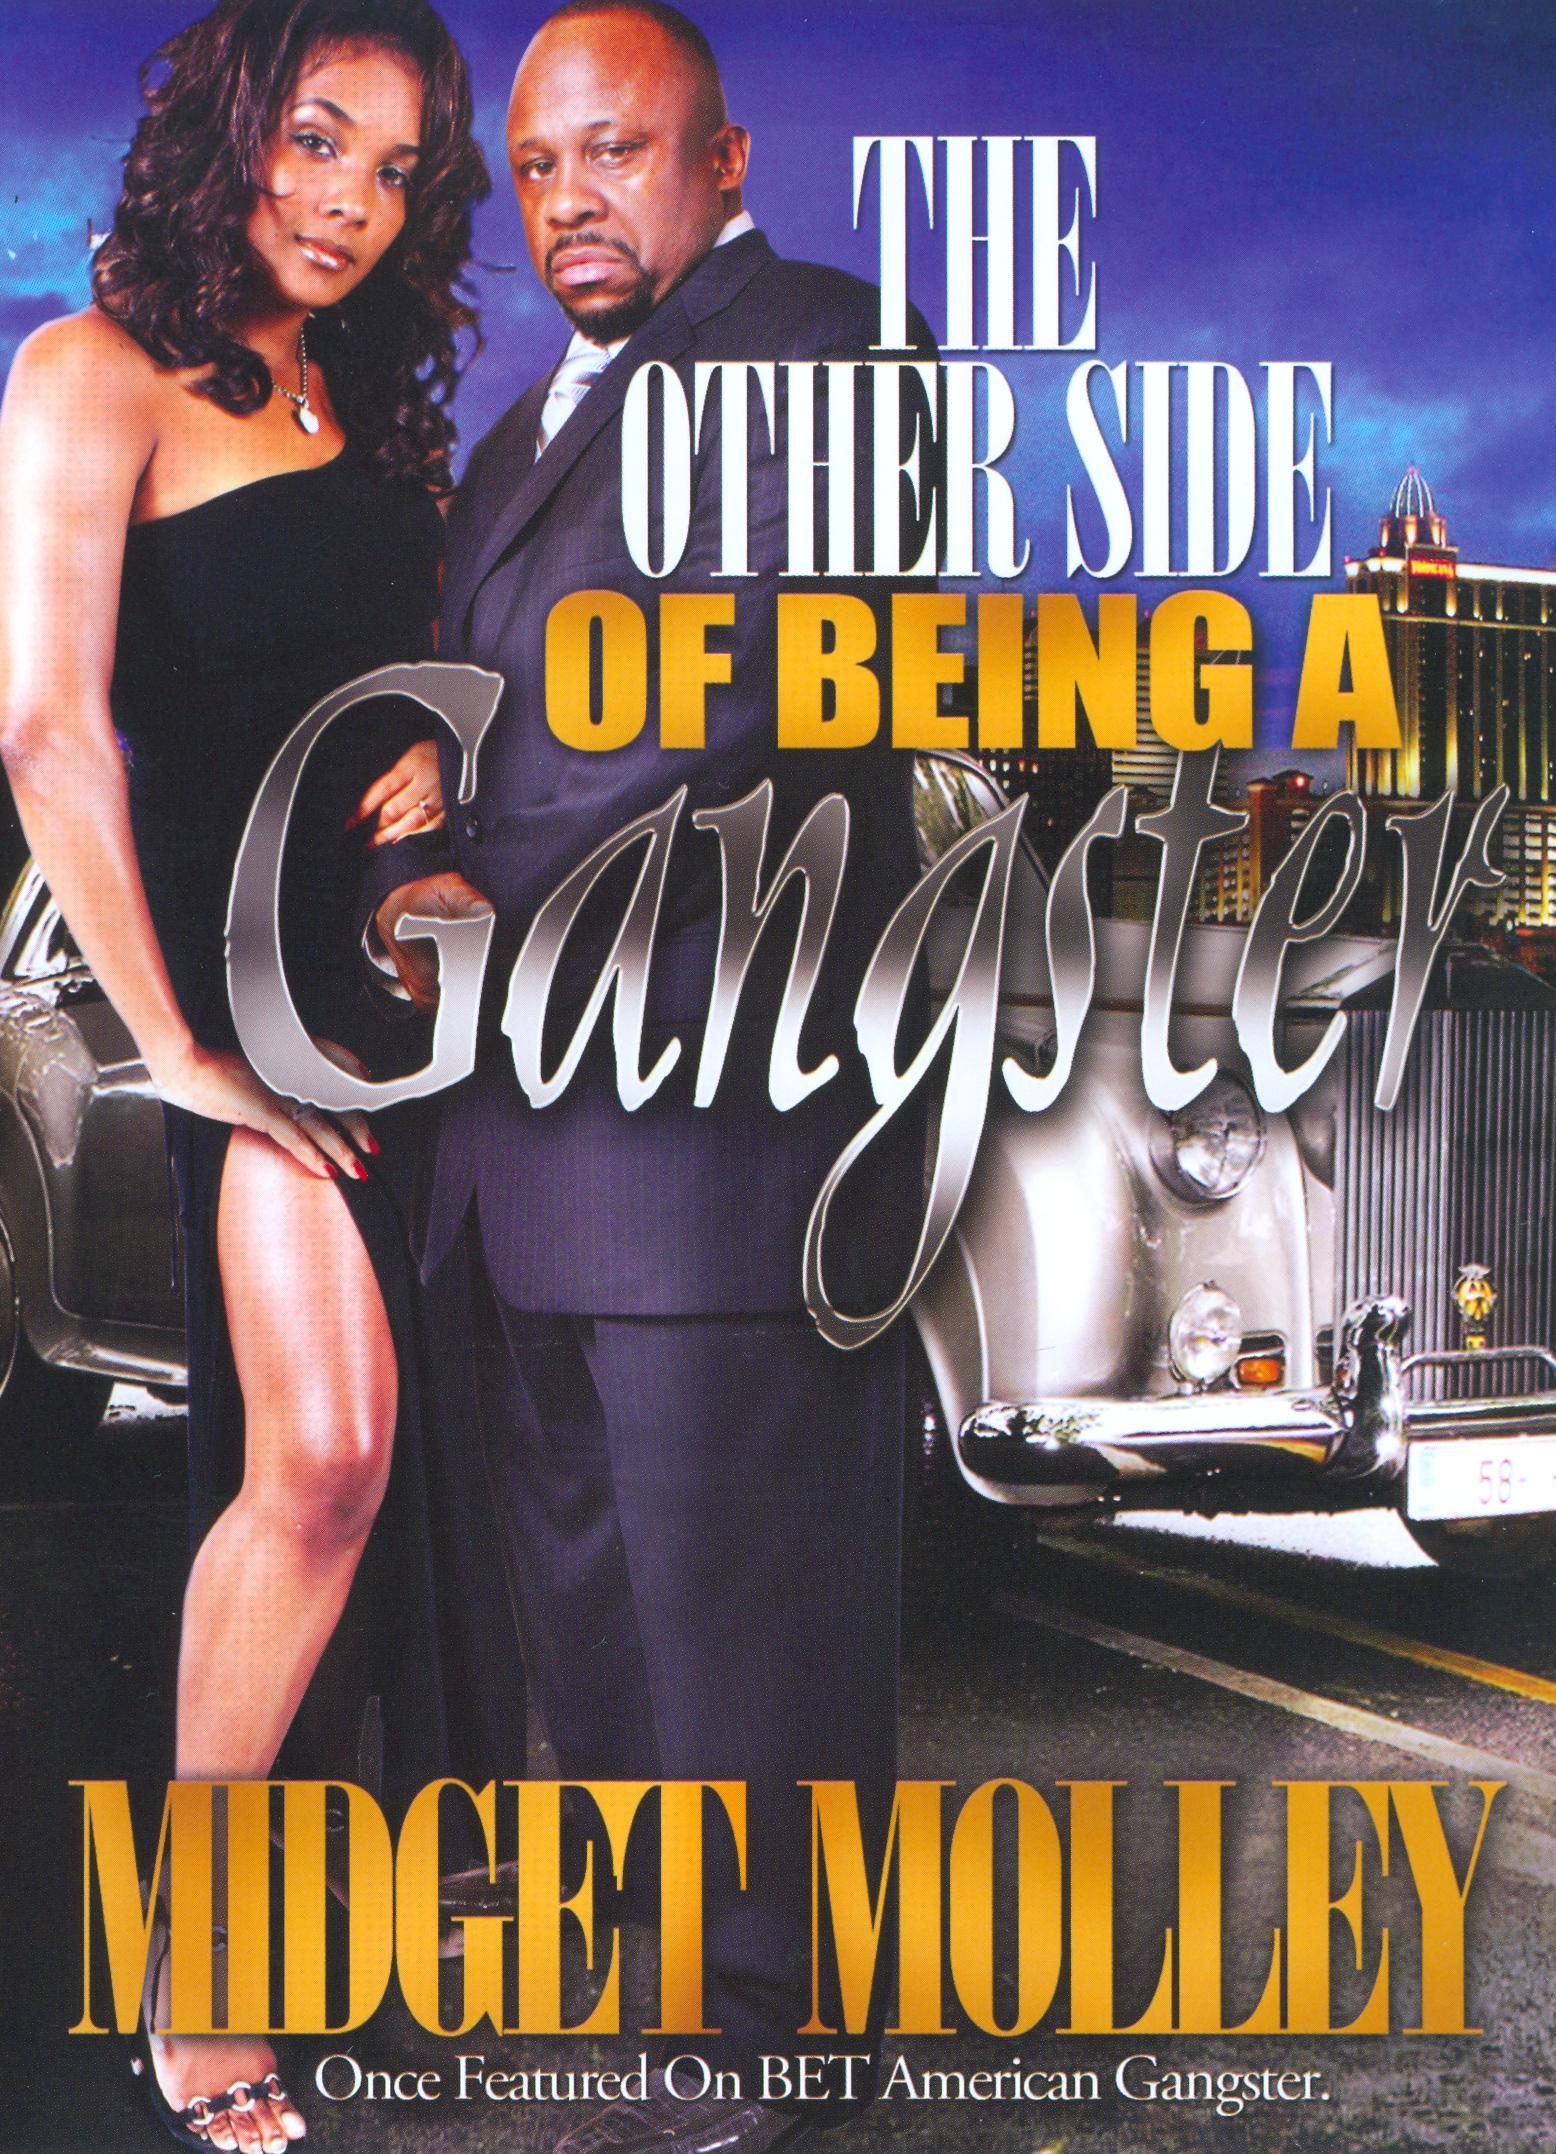 Gangster midget molley